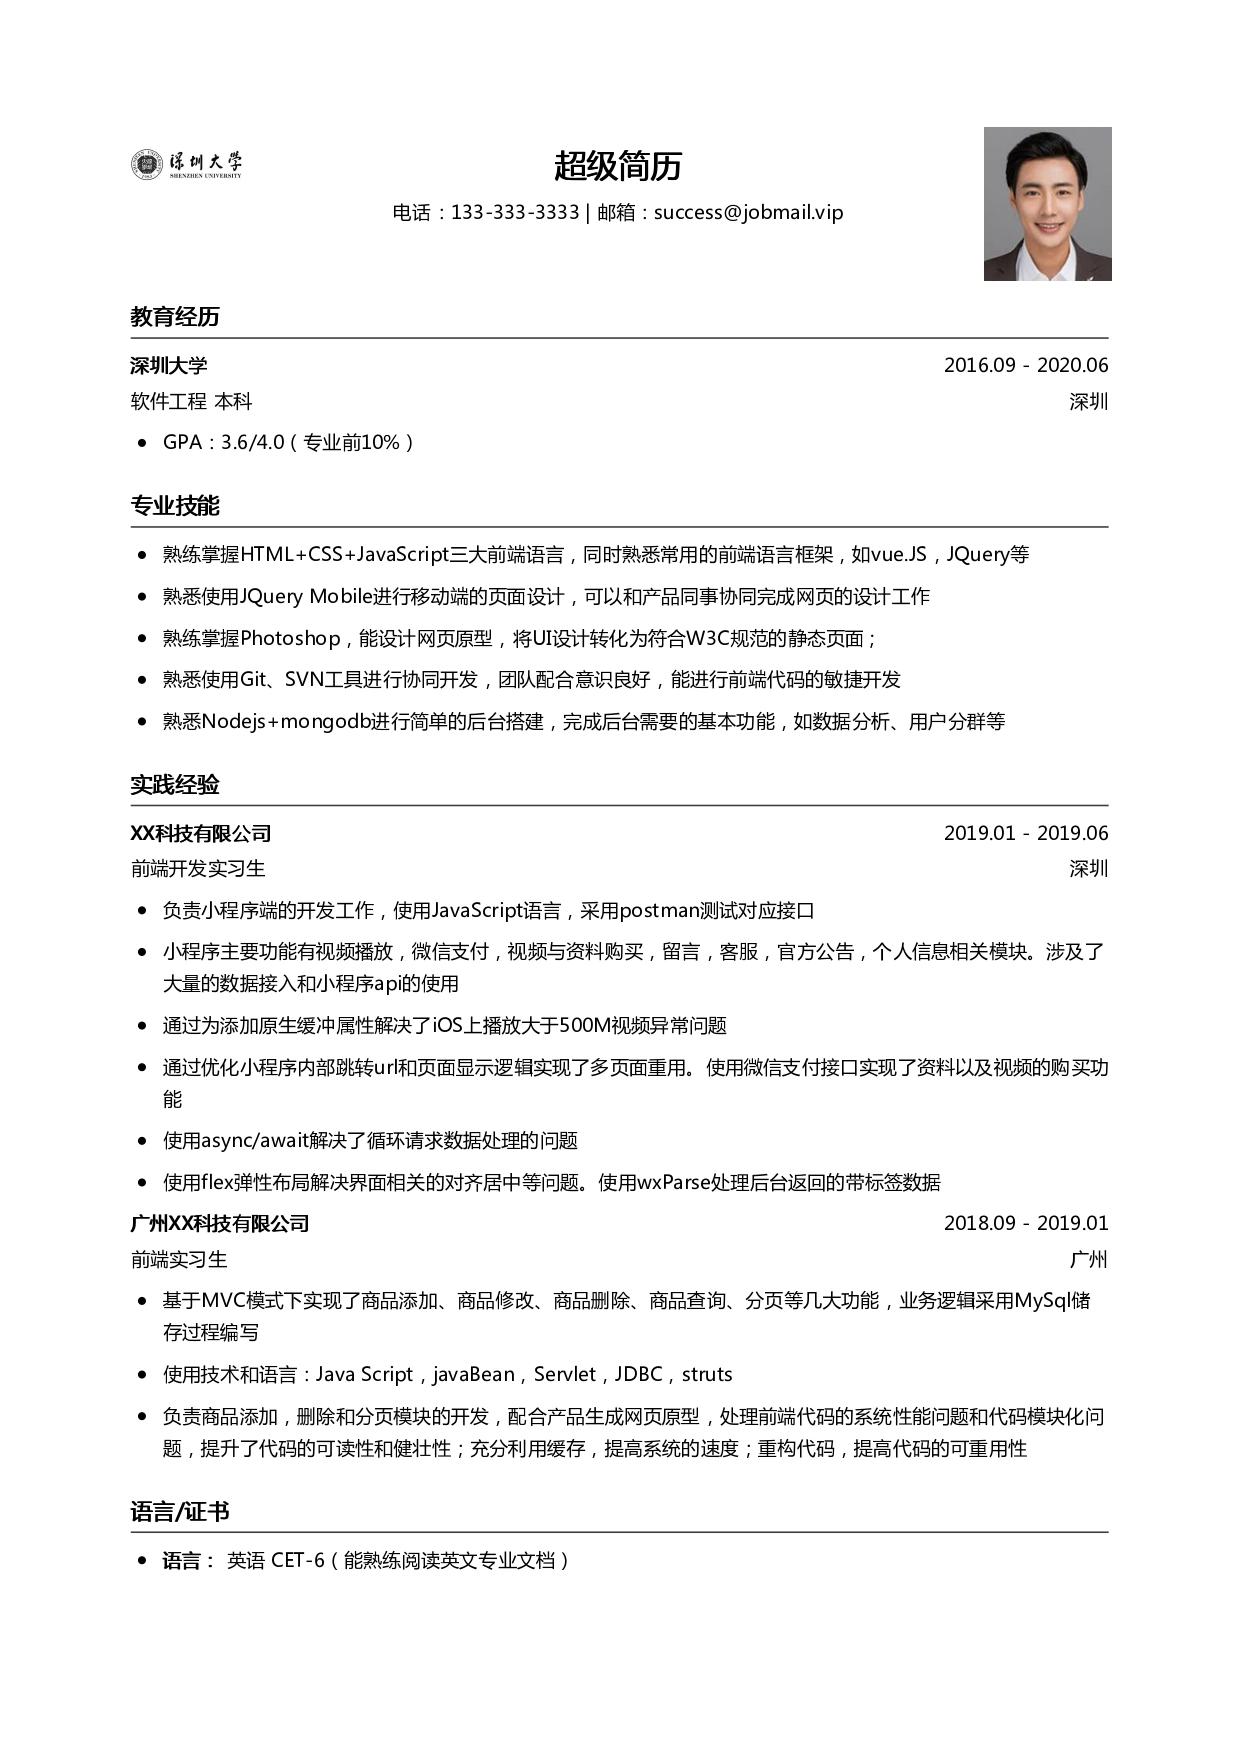 Web前端工程师简历模板(应届生)